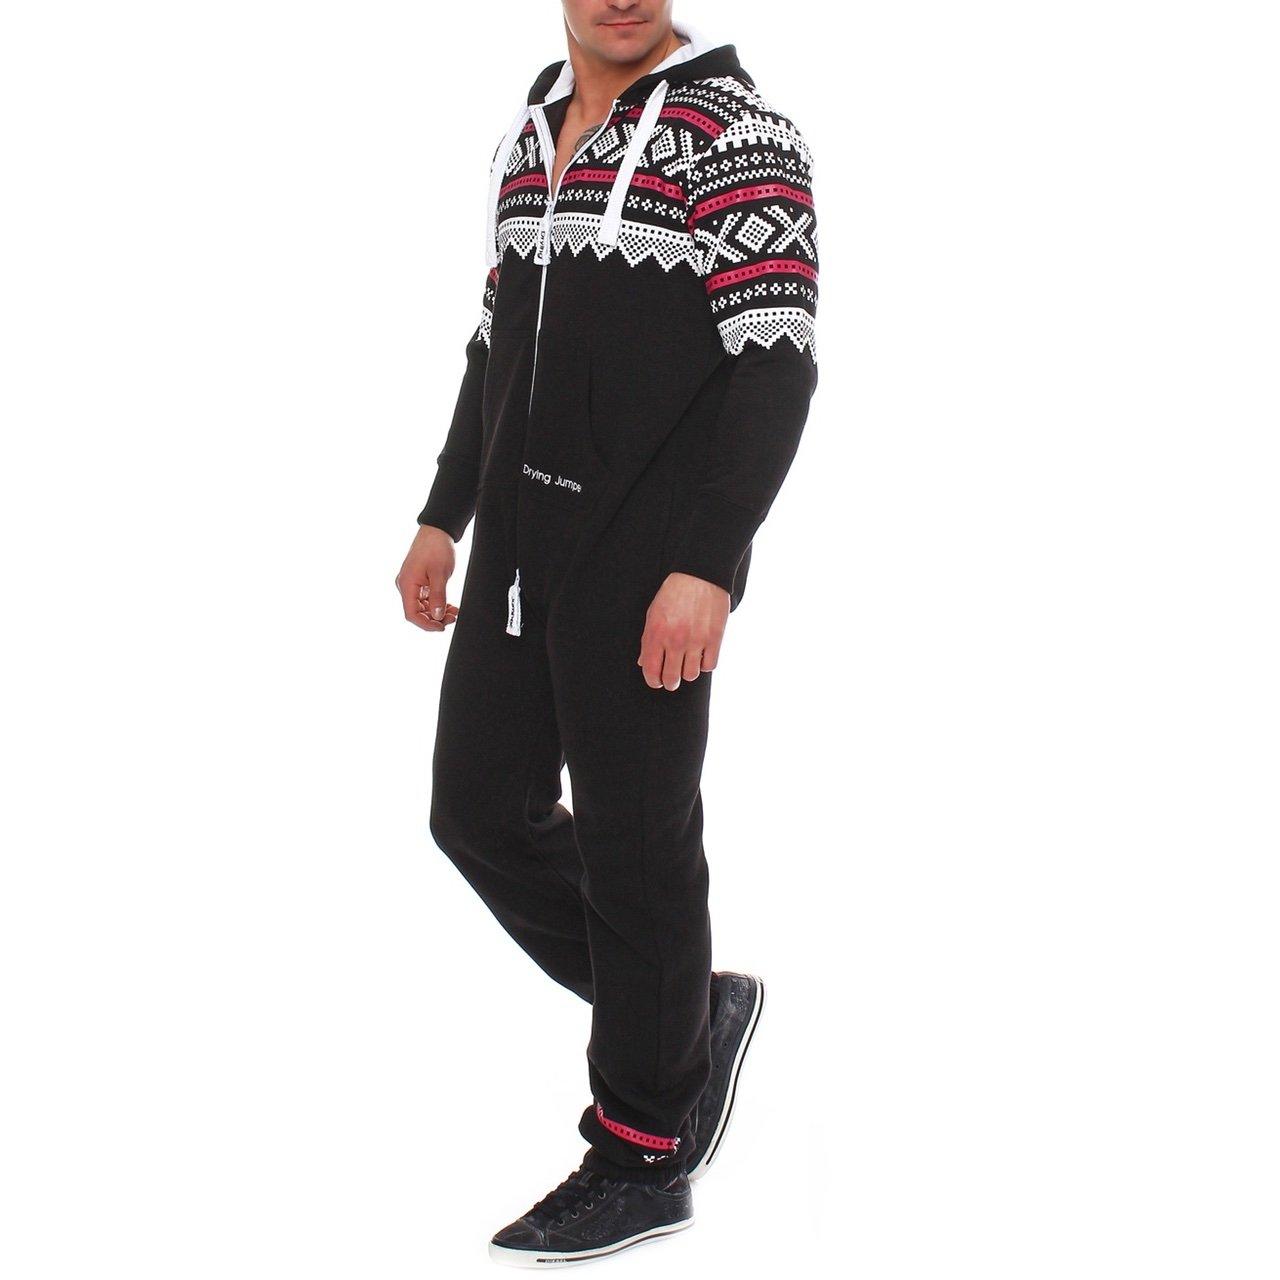 Drying Jumper Herren Jumpsuit Overall Jogging Anzug Trainingsanzug